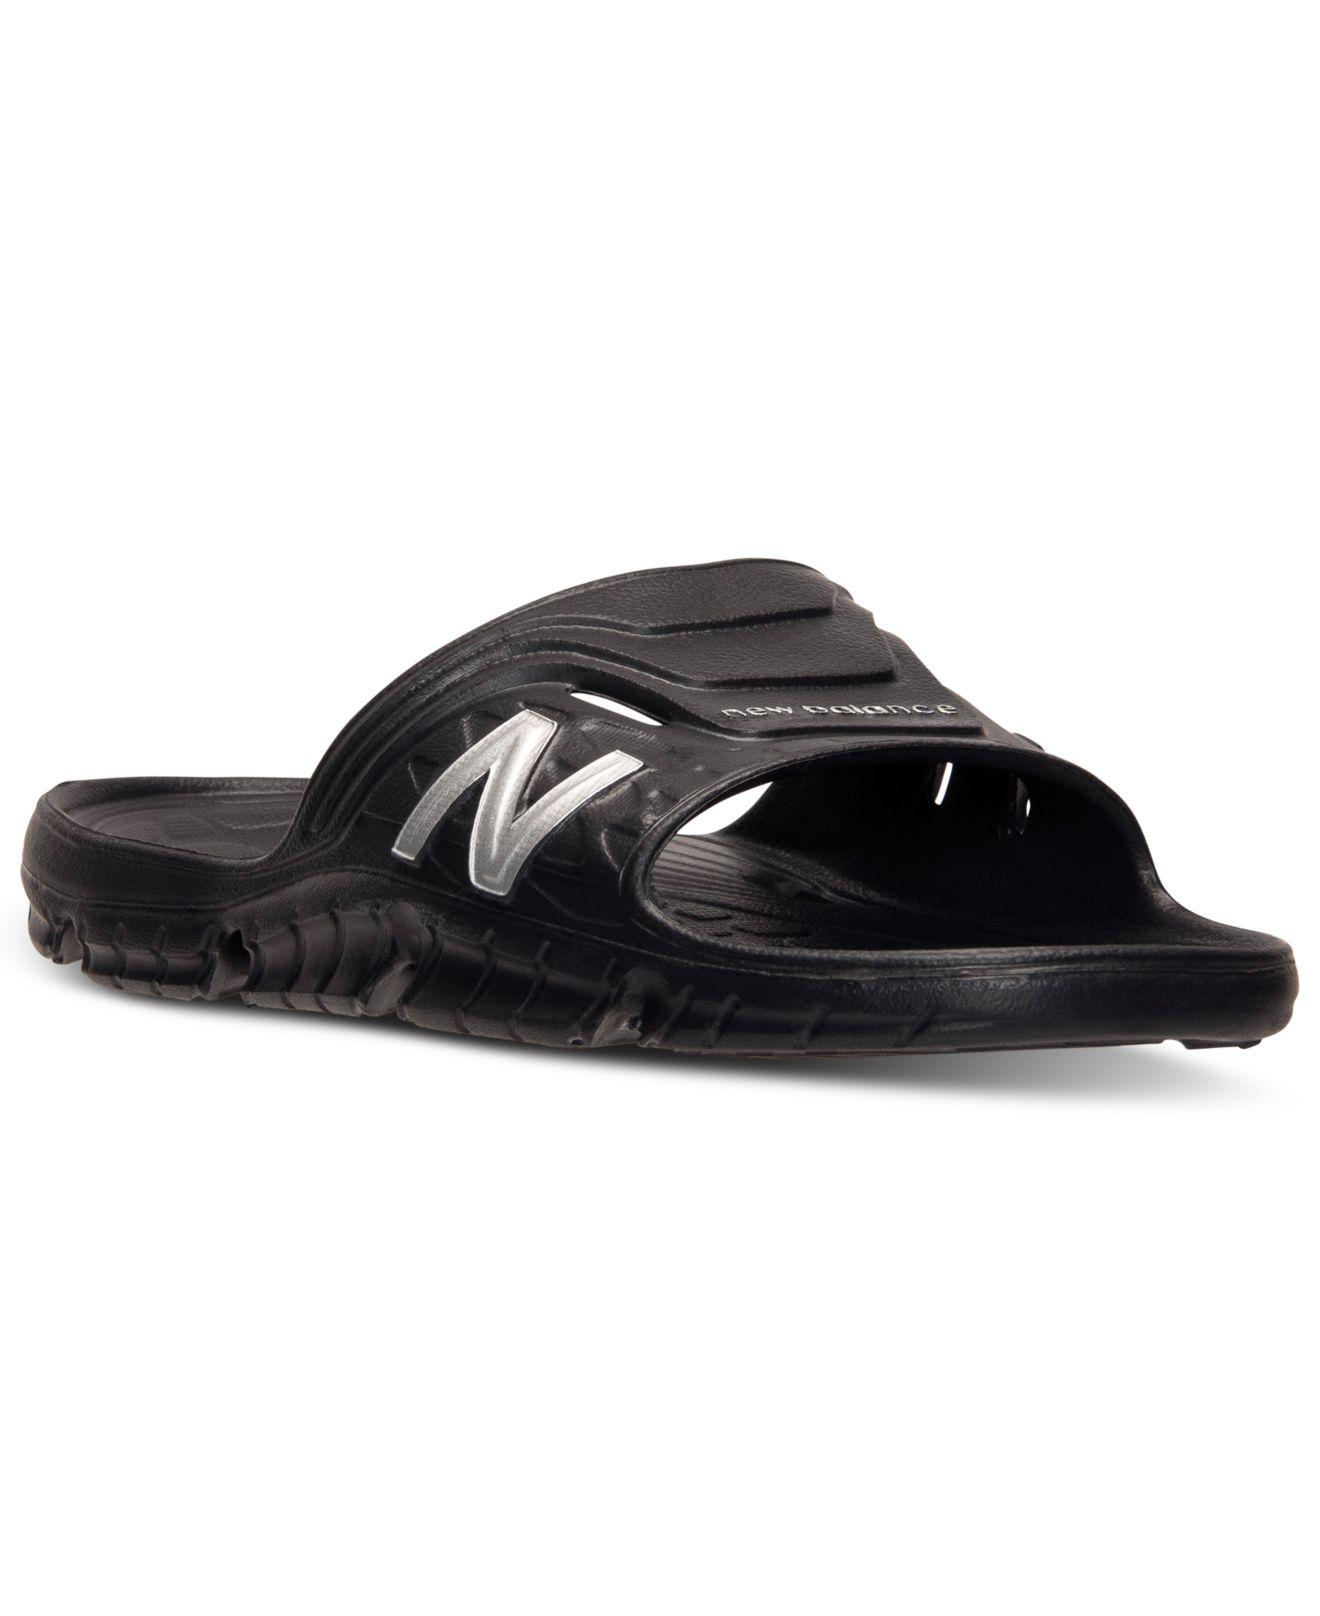 652e1fa904e Lyst - New Balance Men S Klone Lab Float Ii Slide Sandals in Black ...